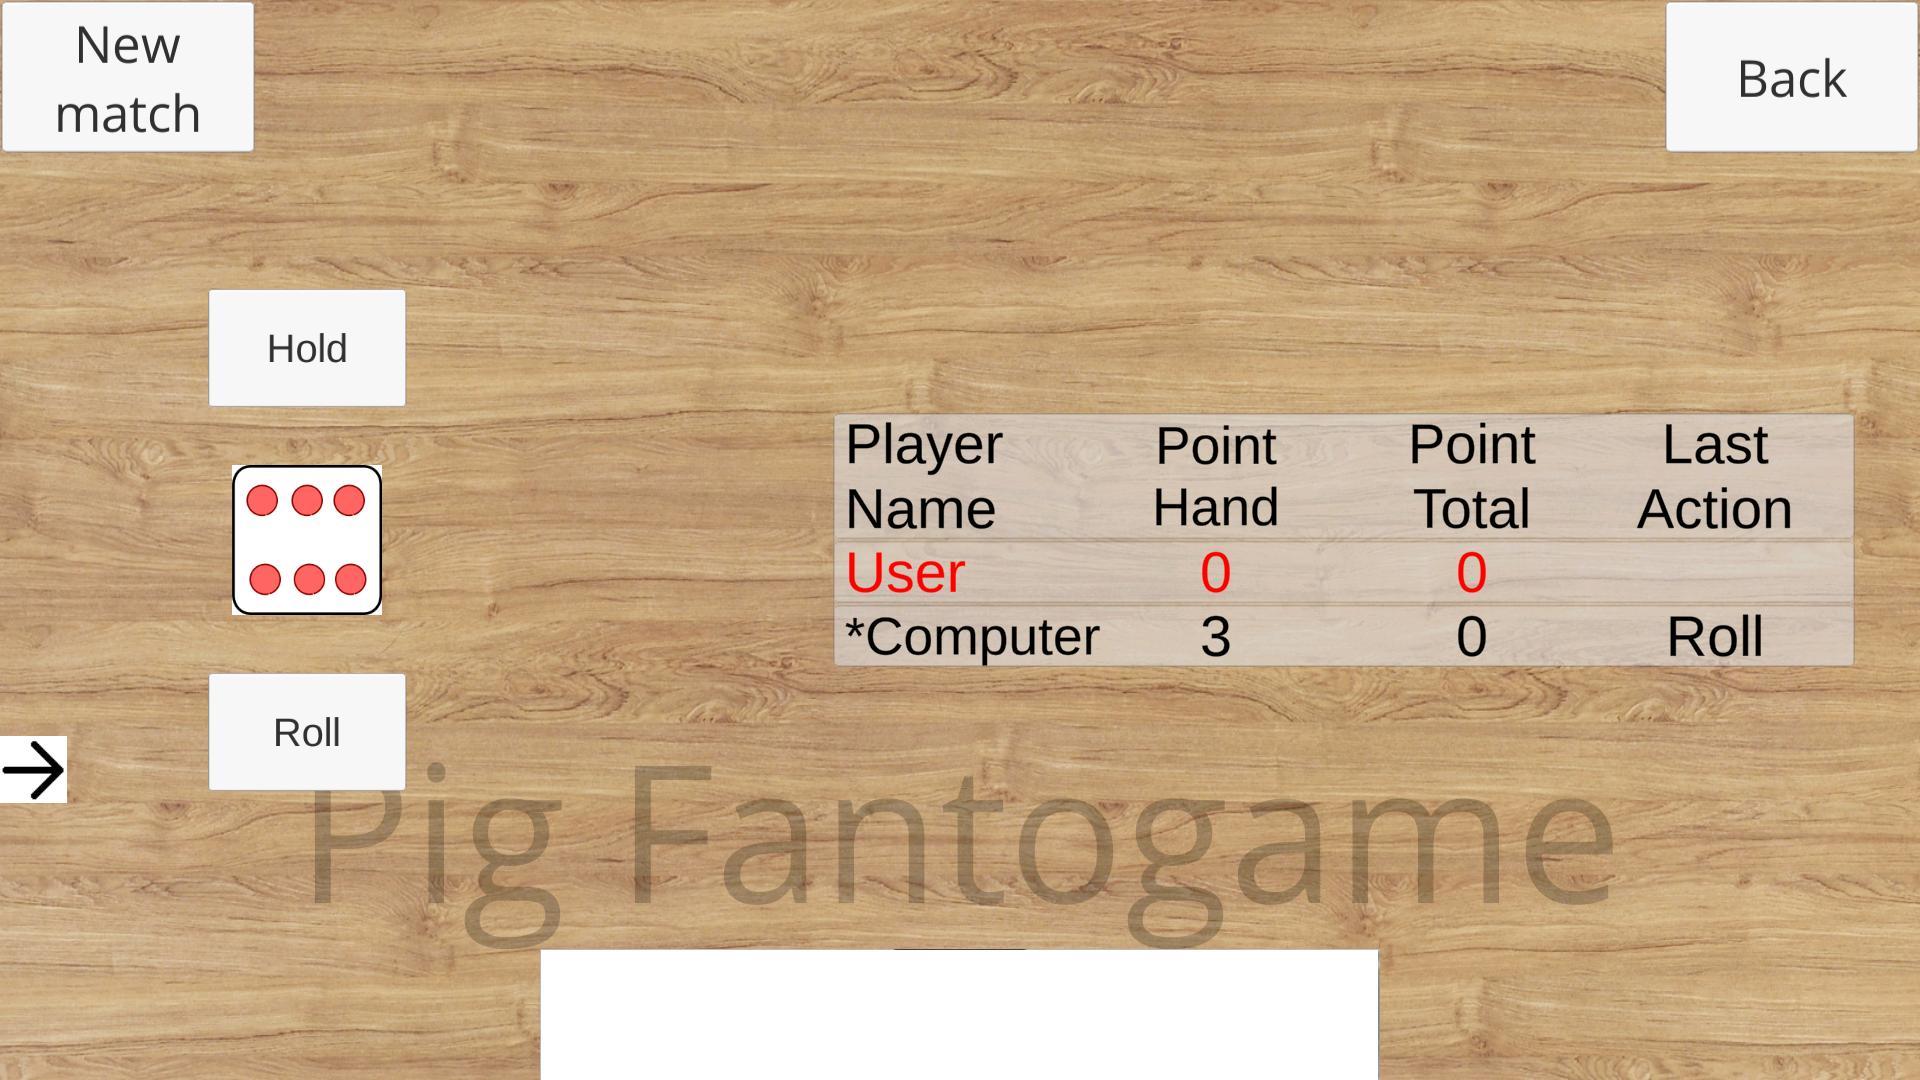 Pig Fantogame 1.1 Screenshot 1